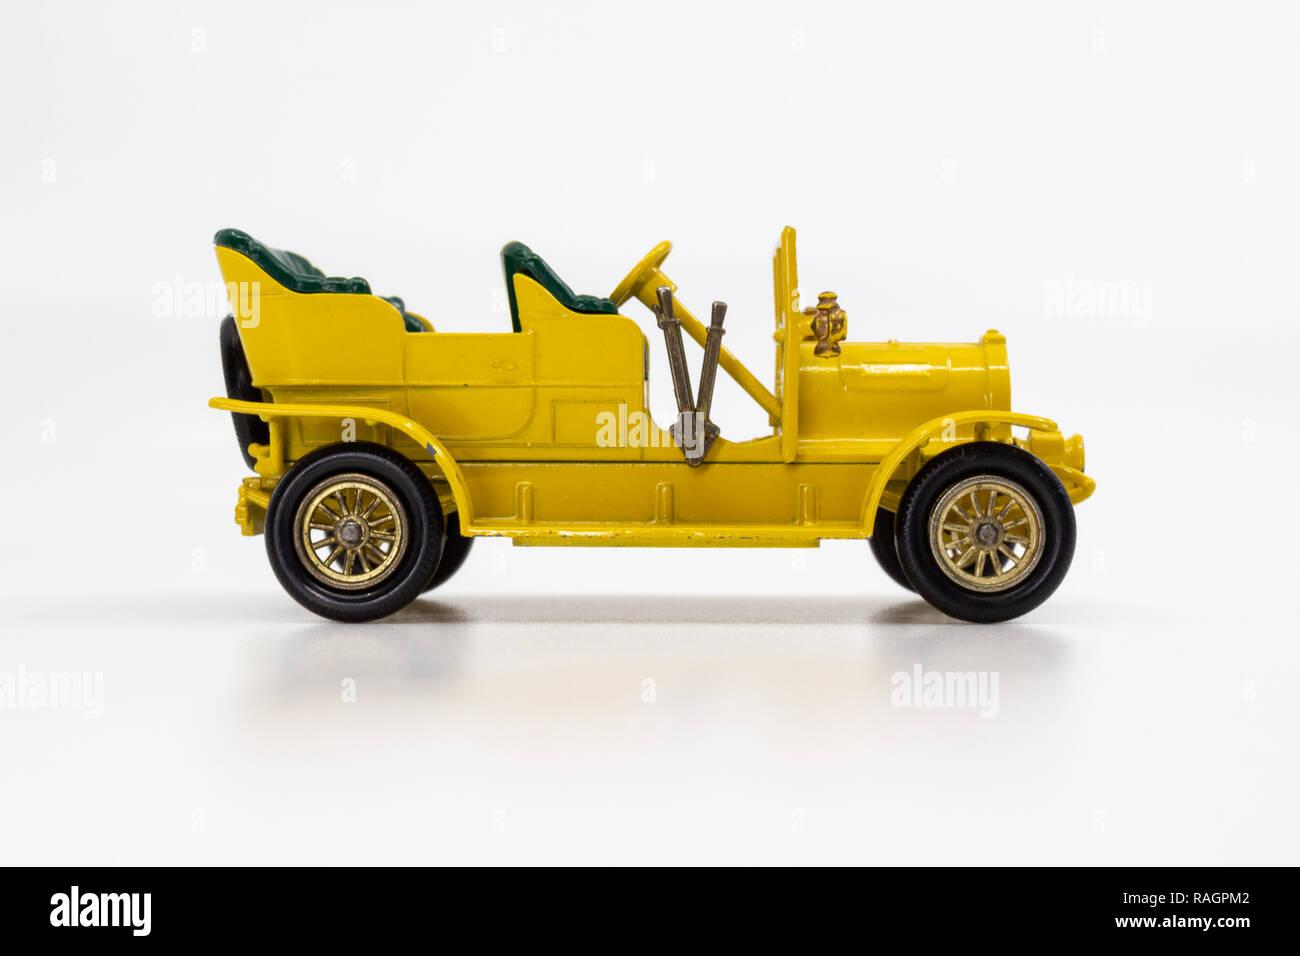 Matchbox Models of Yesteryear Y-6 Spyker Tourer 1904 - Stock Image